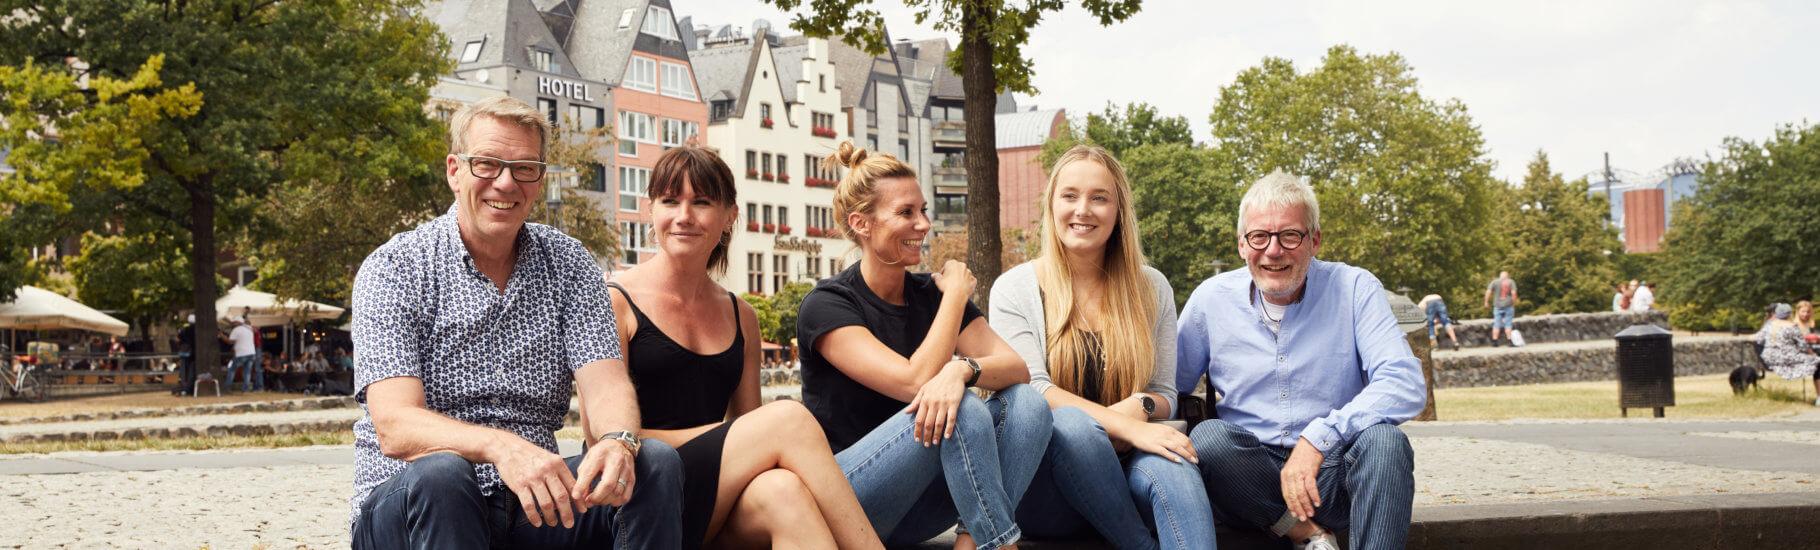 Das-Mplus-Akademie-Team-in-Köln